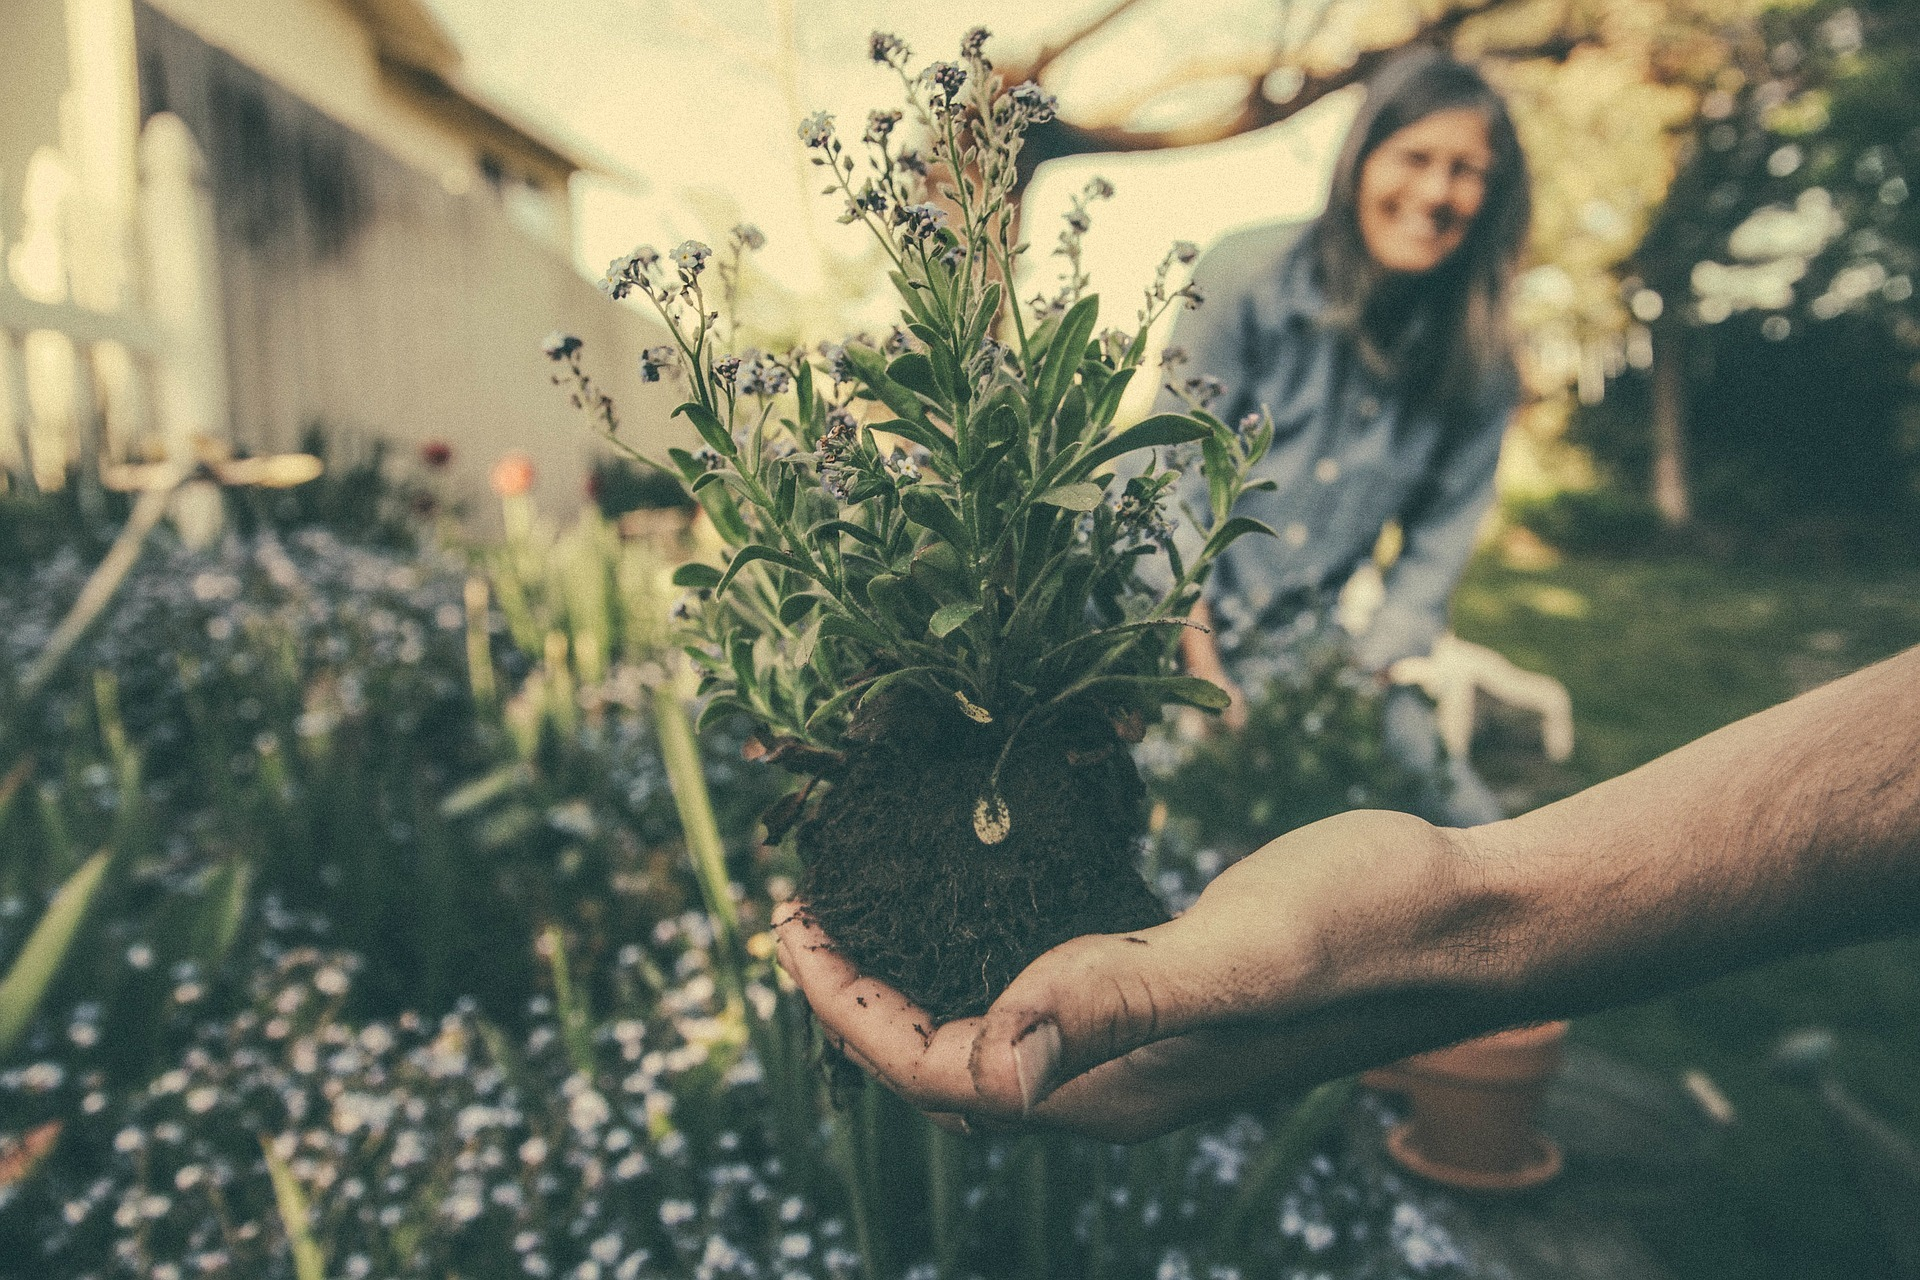 Beginner's Guide On How To Start Flower Gardening In Your Home